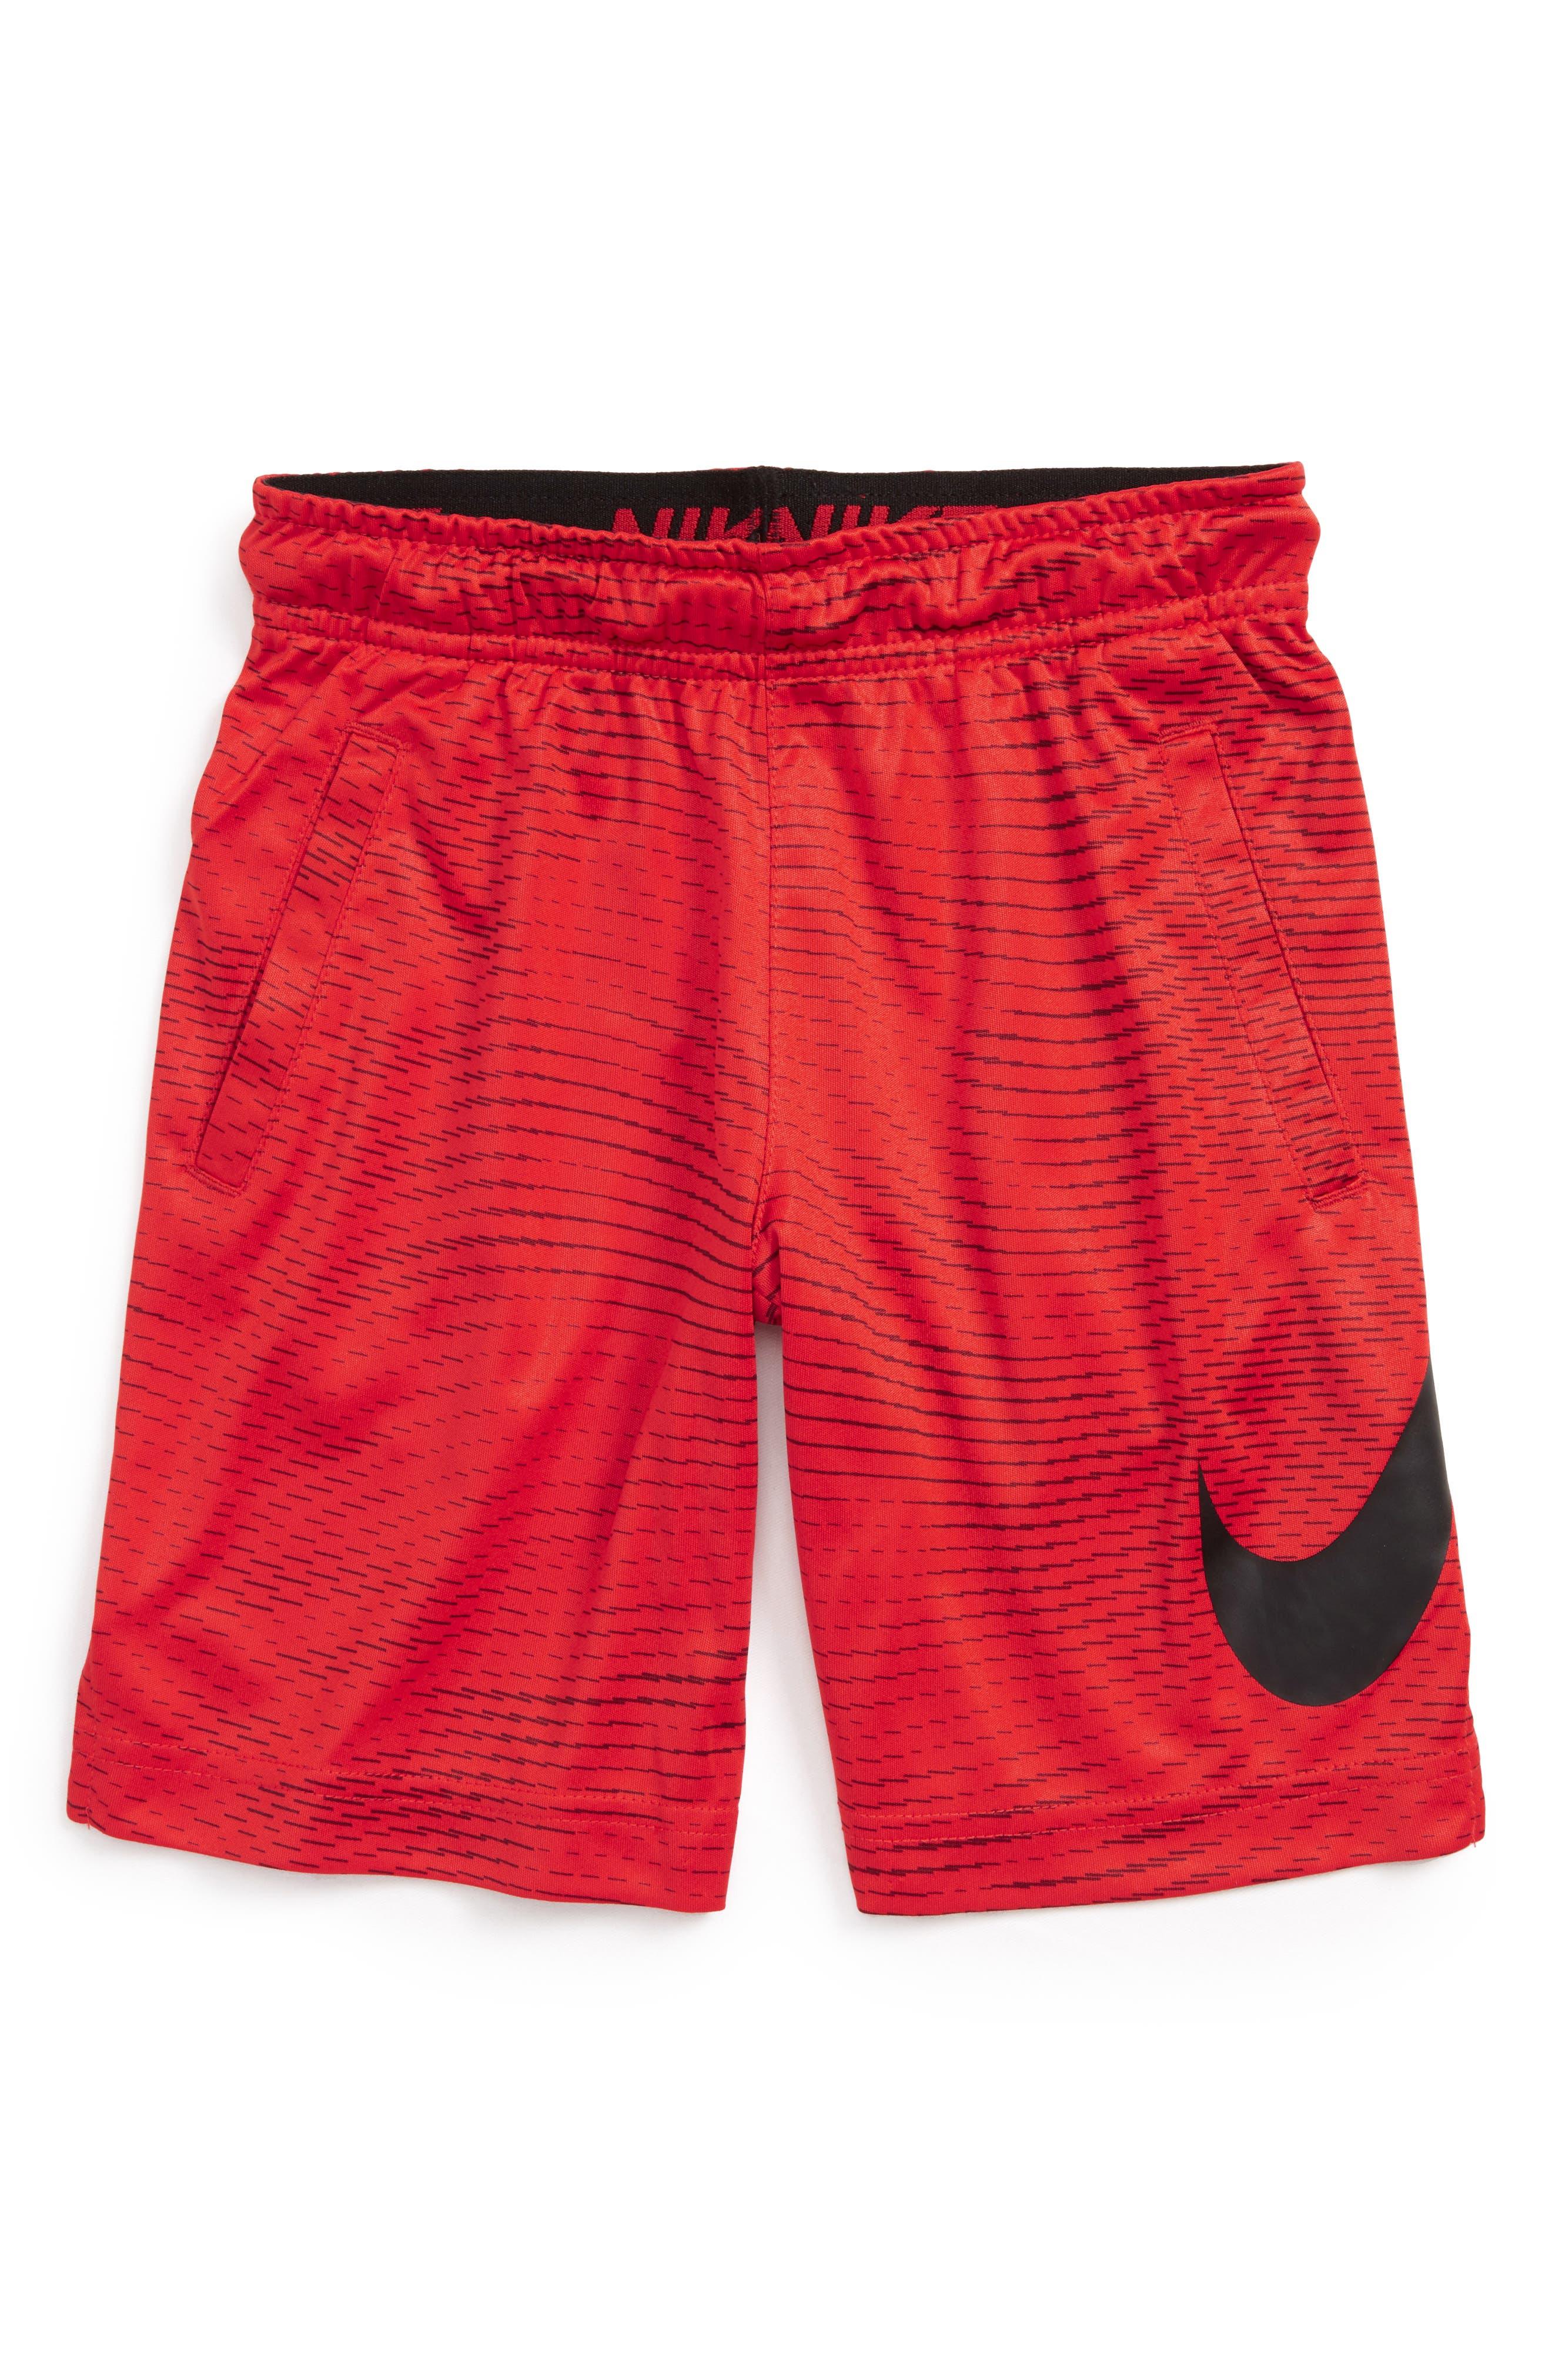 Nike Dry Athletic Shorts (Toddler Boys & Little Boys)